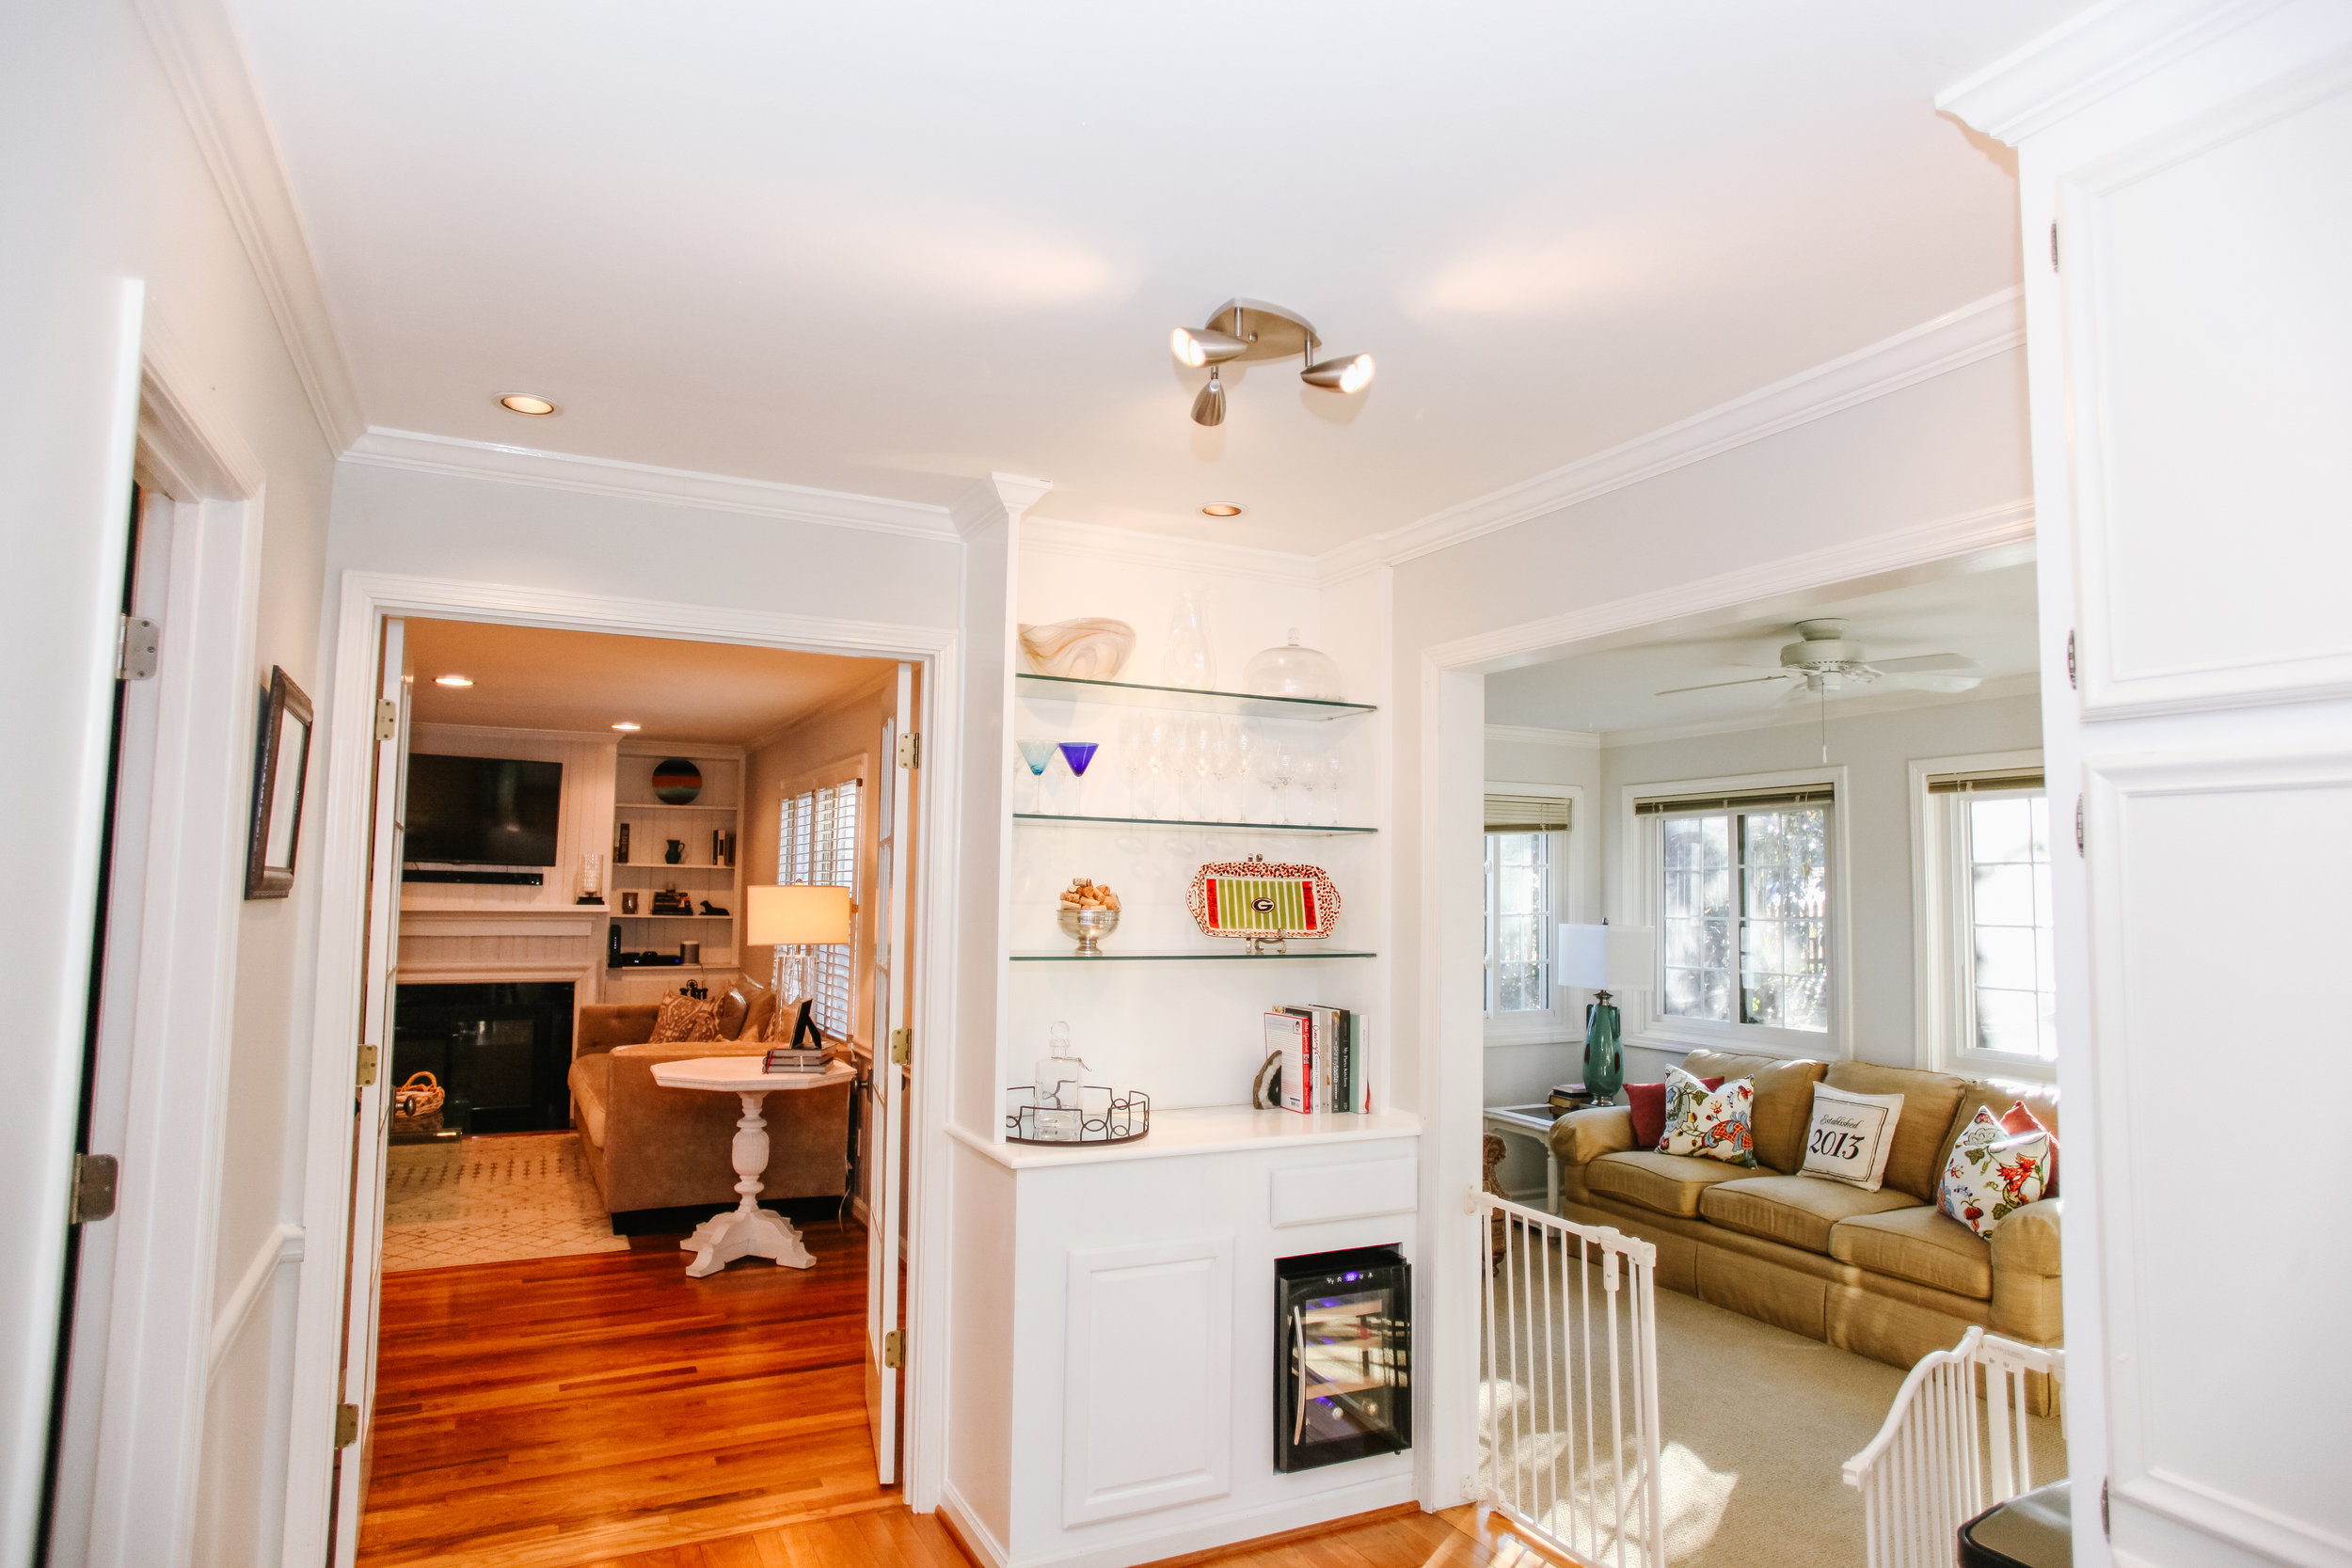 wingard-real-estate-sandy-springs-dream-home-backyard-goals-atlanta-buckhead-41.jpg